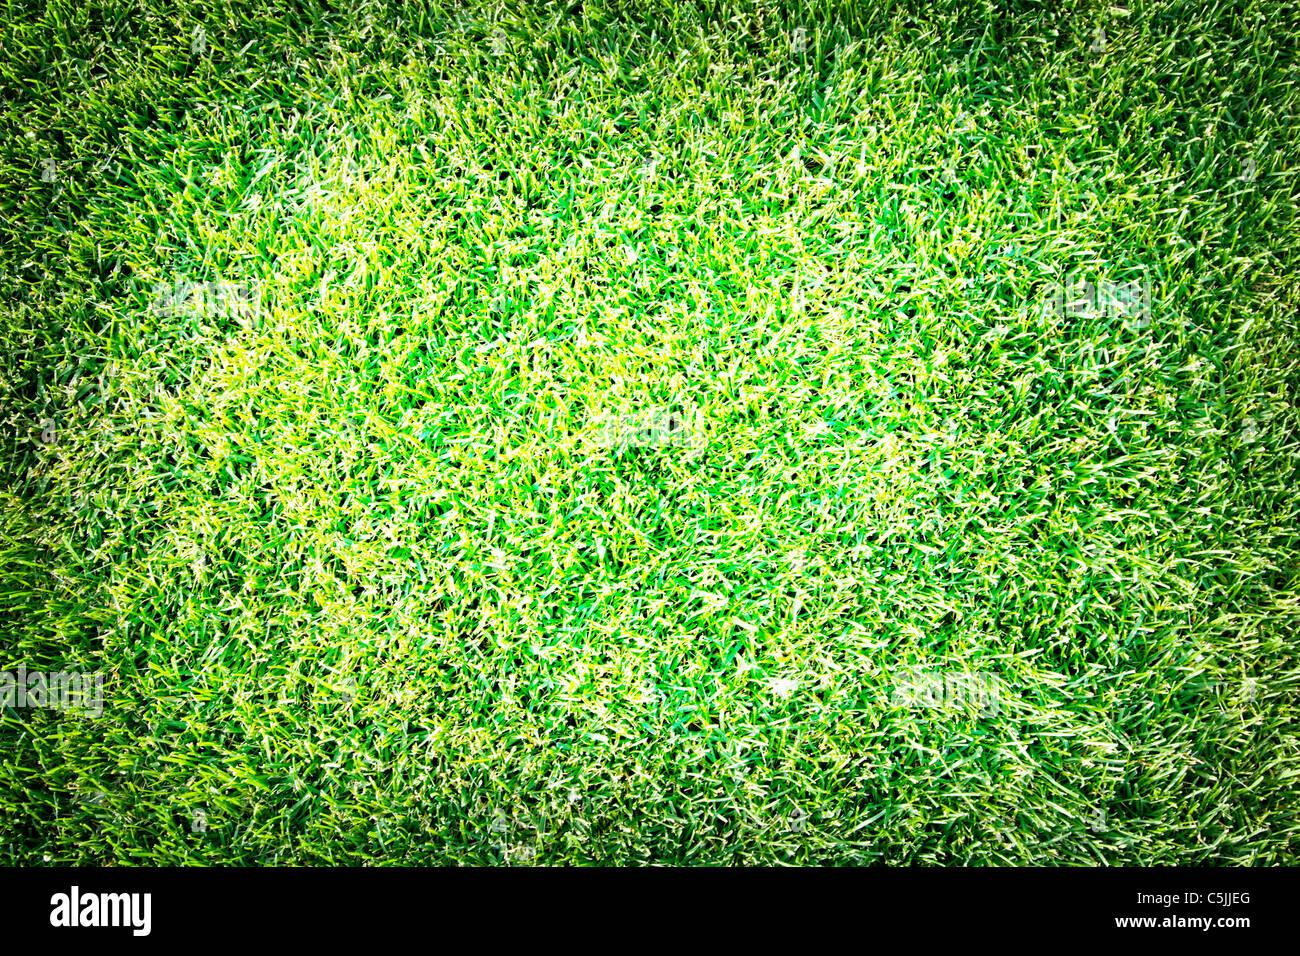 Immagine ravvicinata di fresh spring geen erba. Immagini Stock